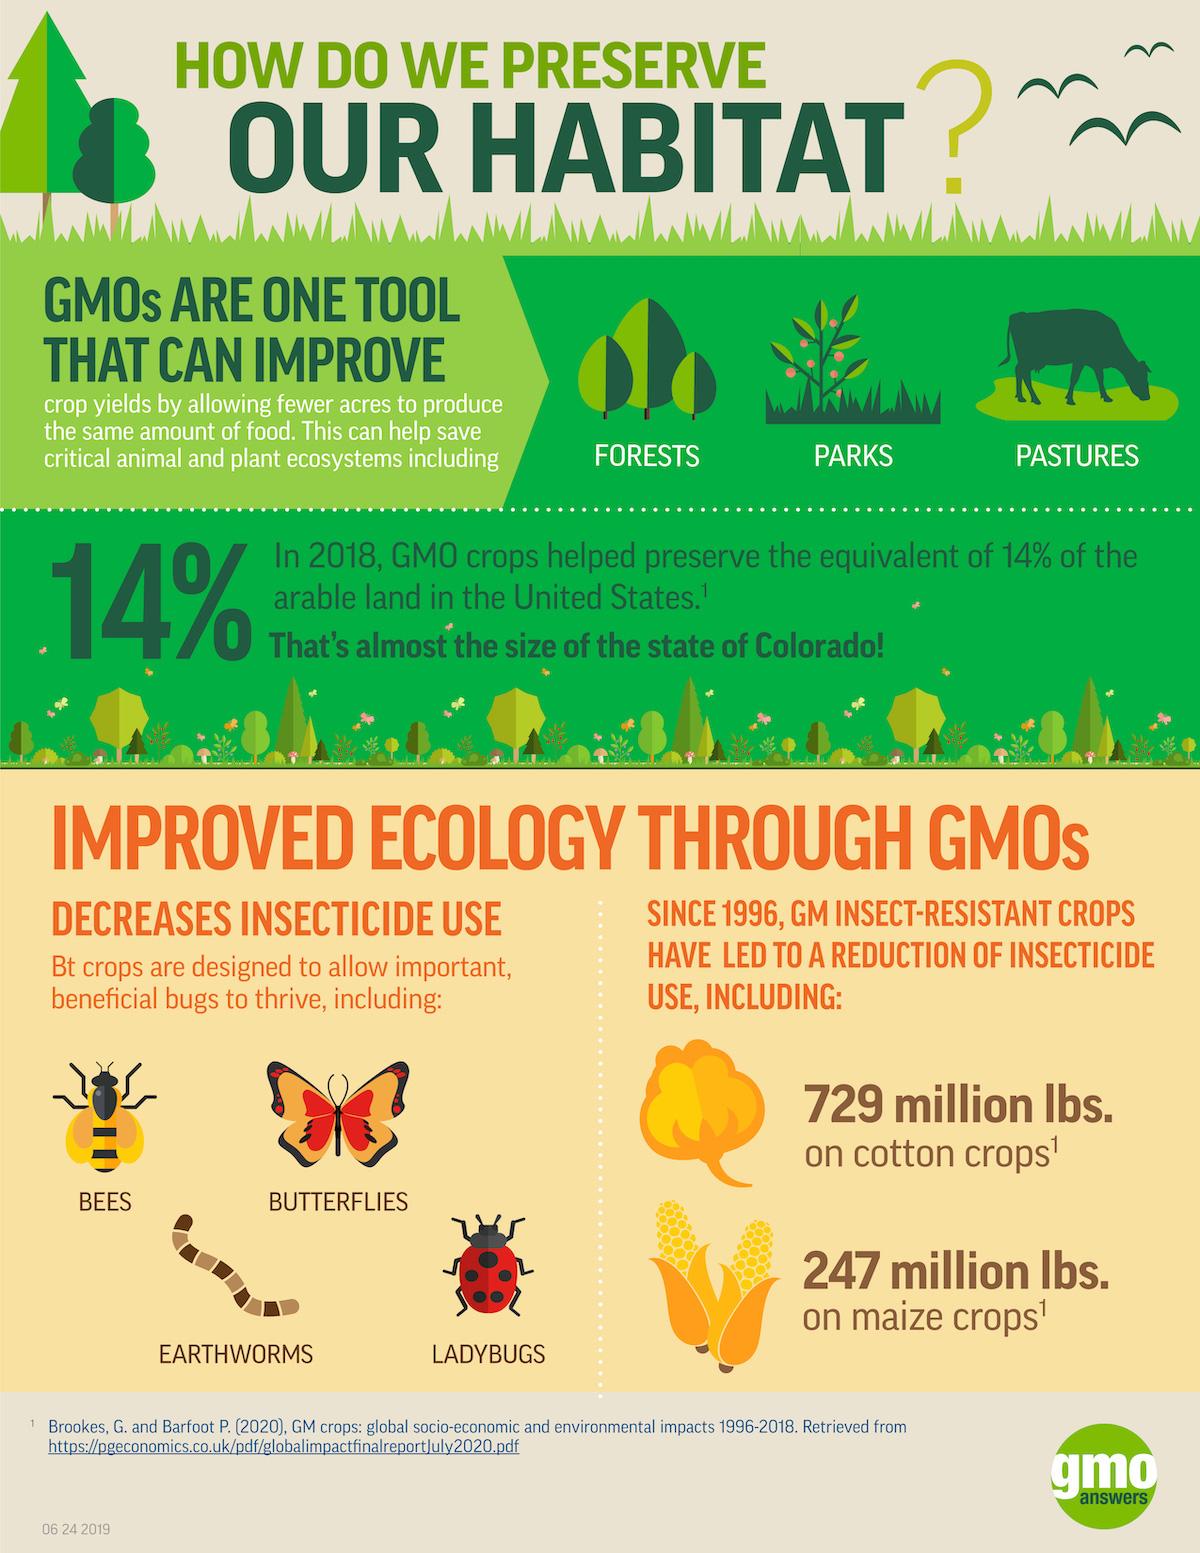 GMOs impact on habitats